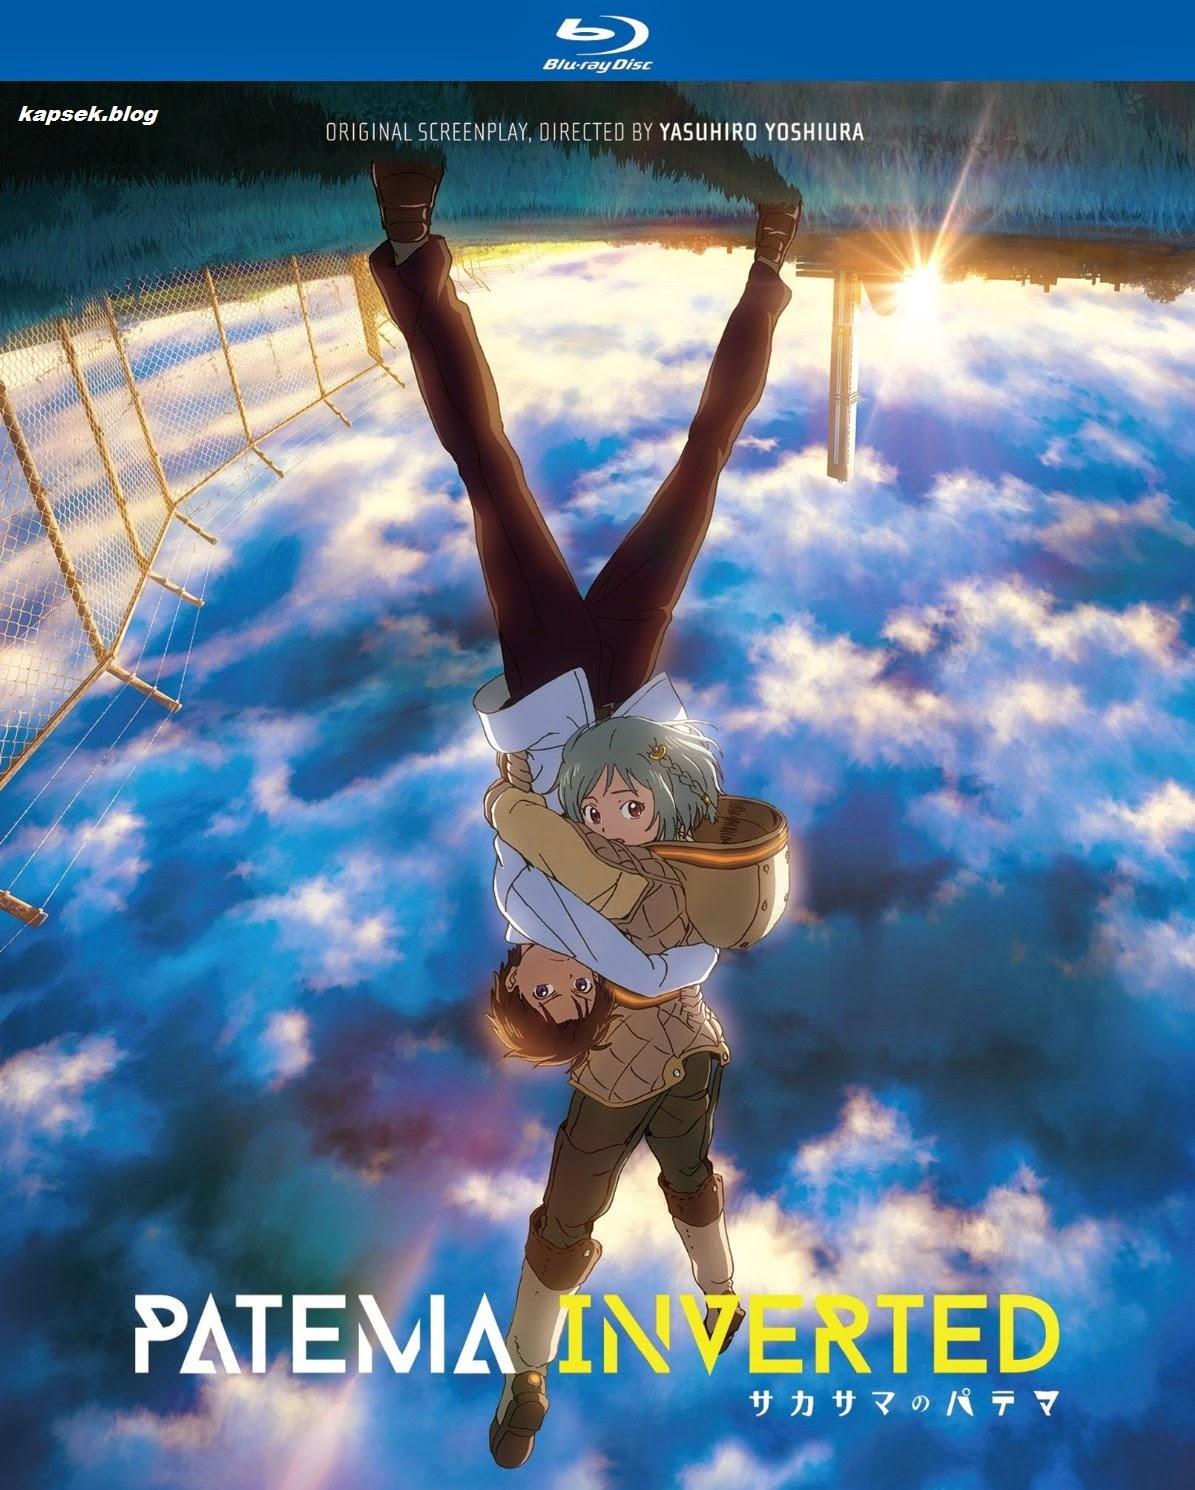 Patema Inverted new movie Hd wallpaper